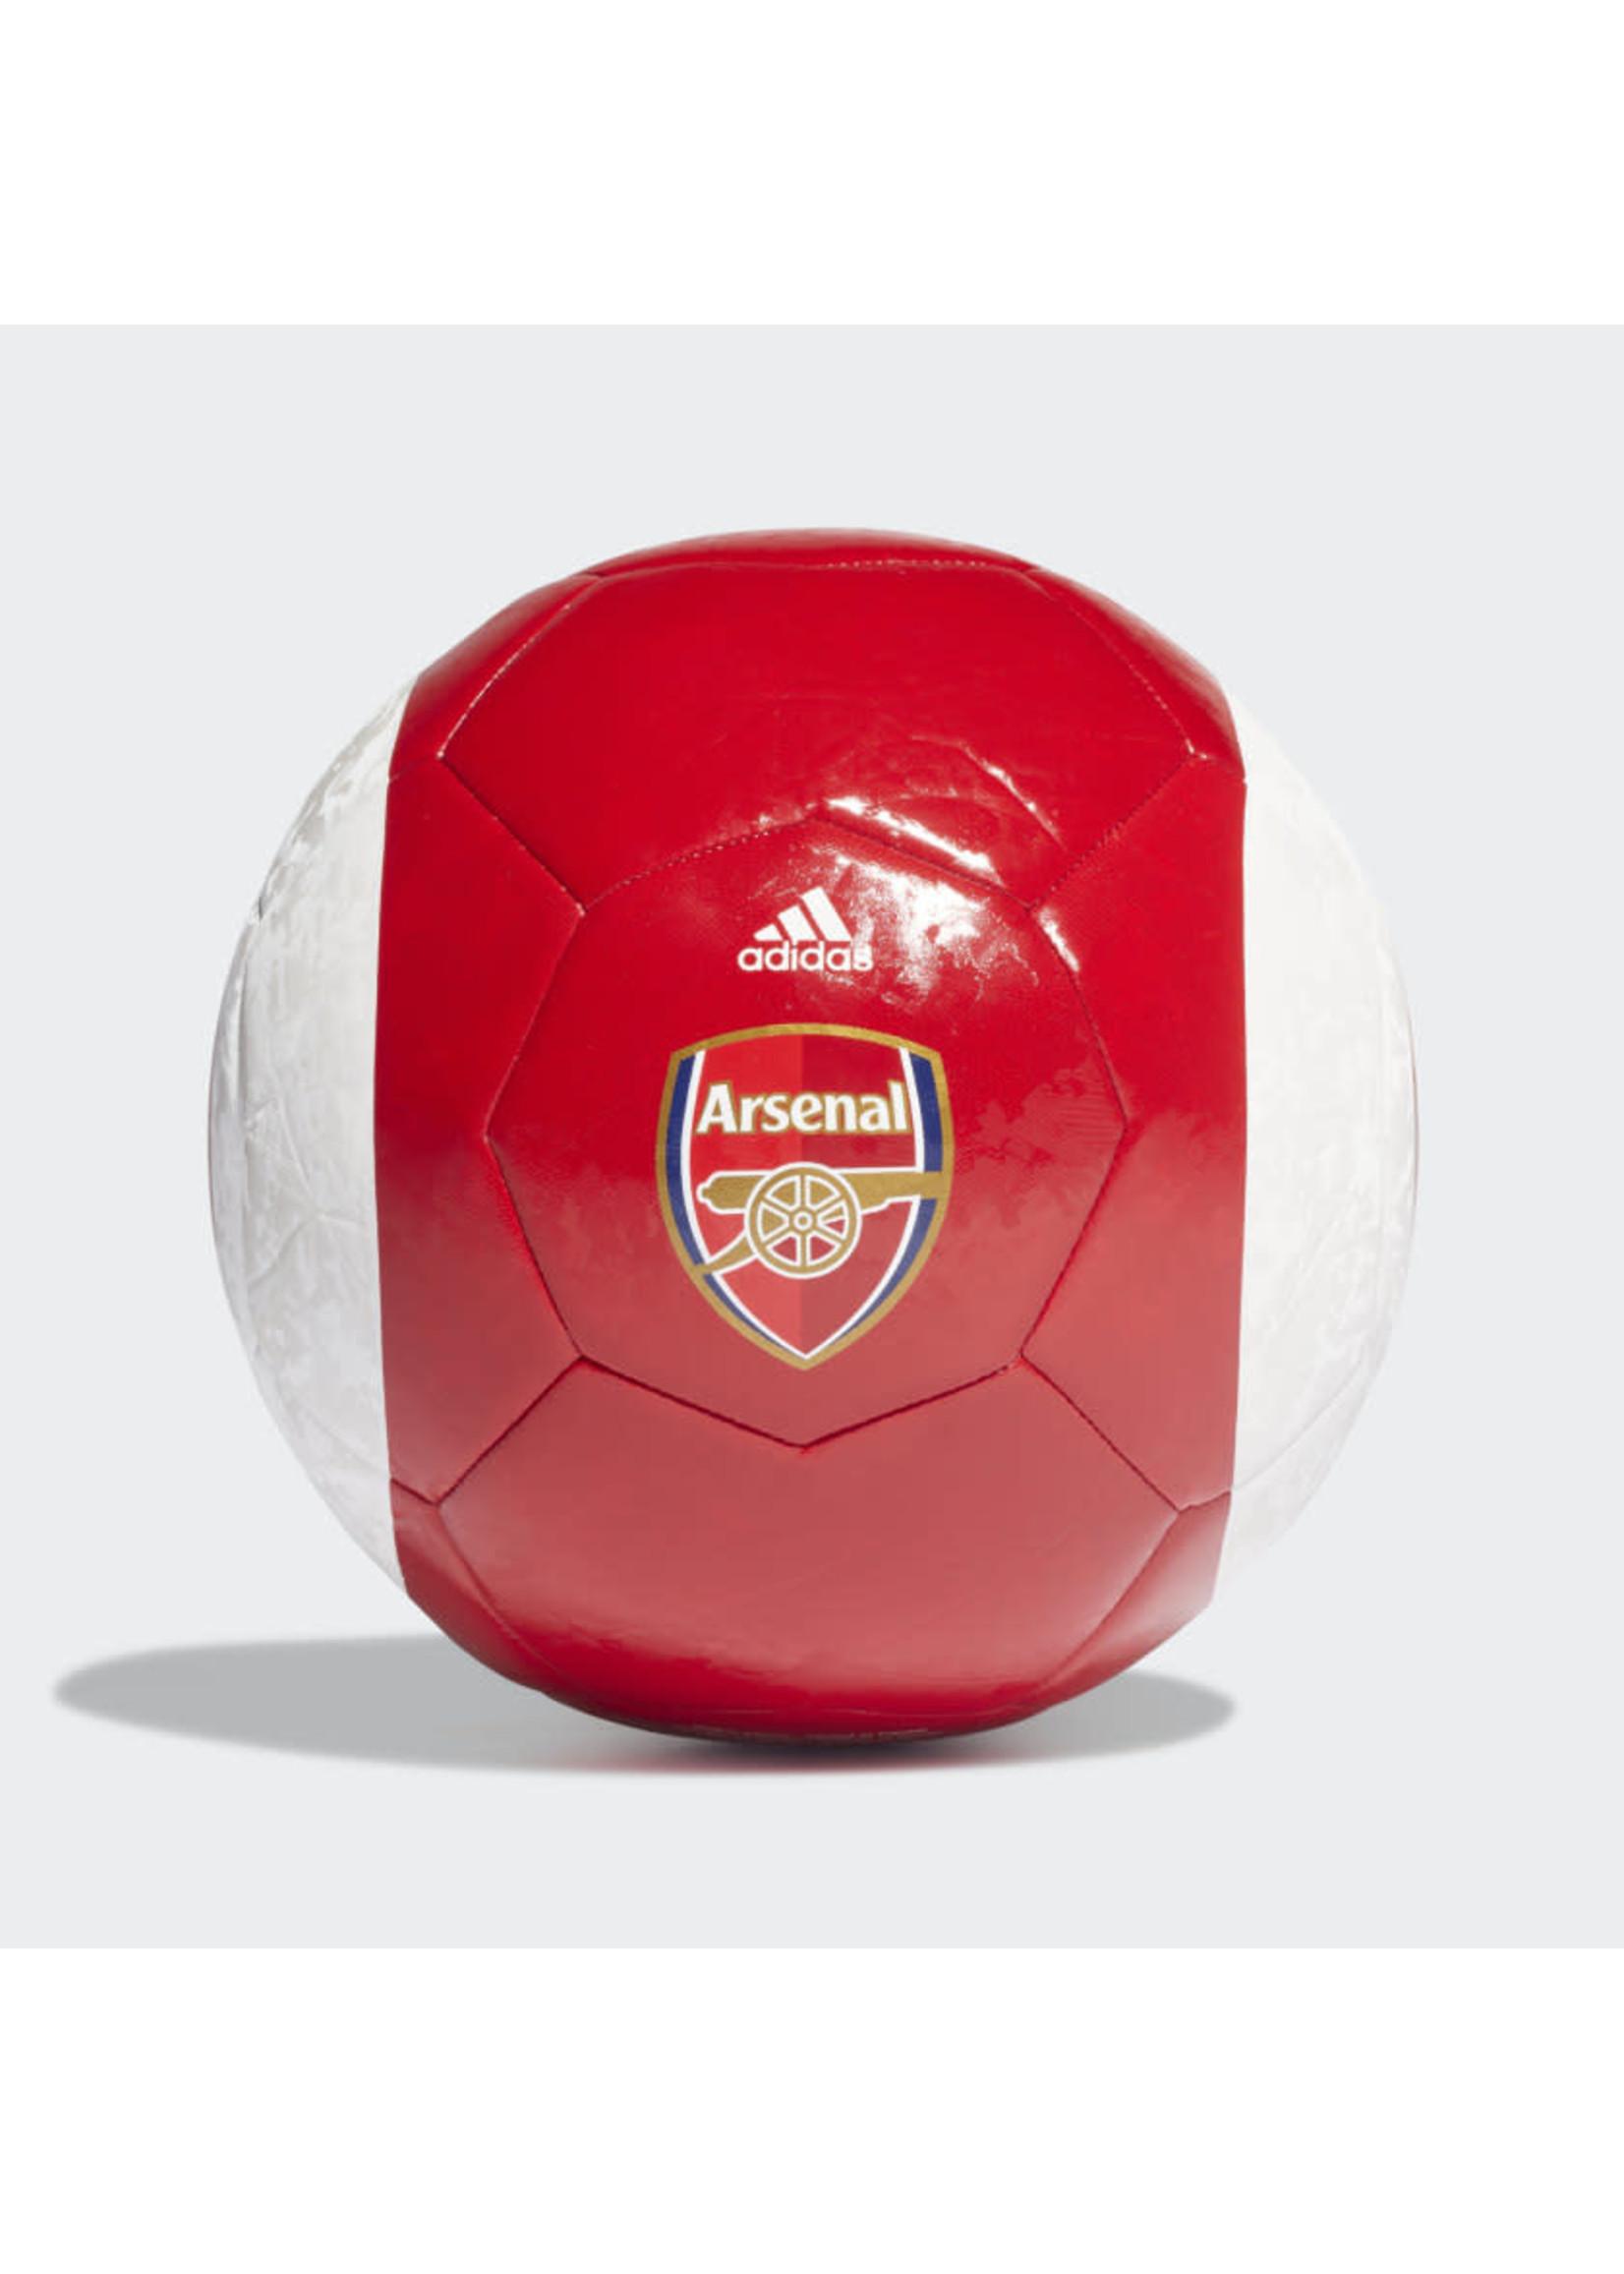 Adidas Arsenal 21/22 Club Ball